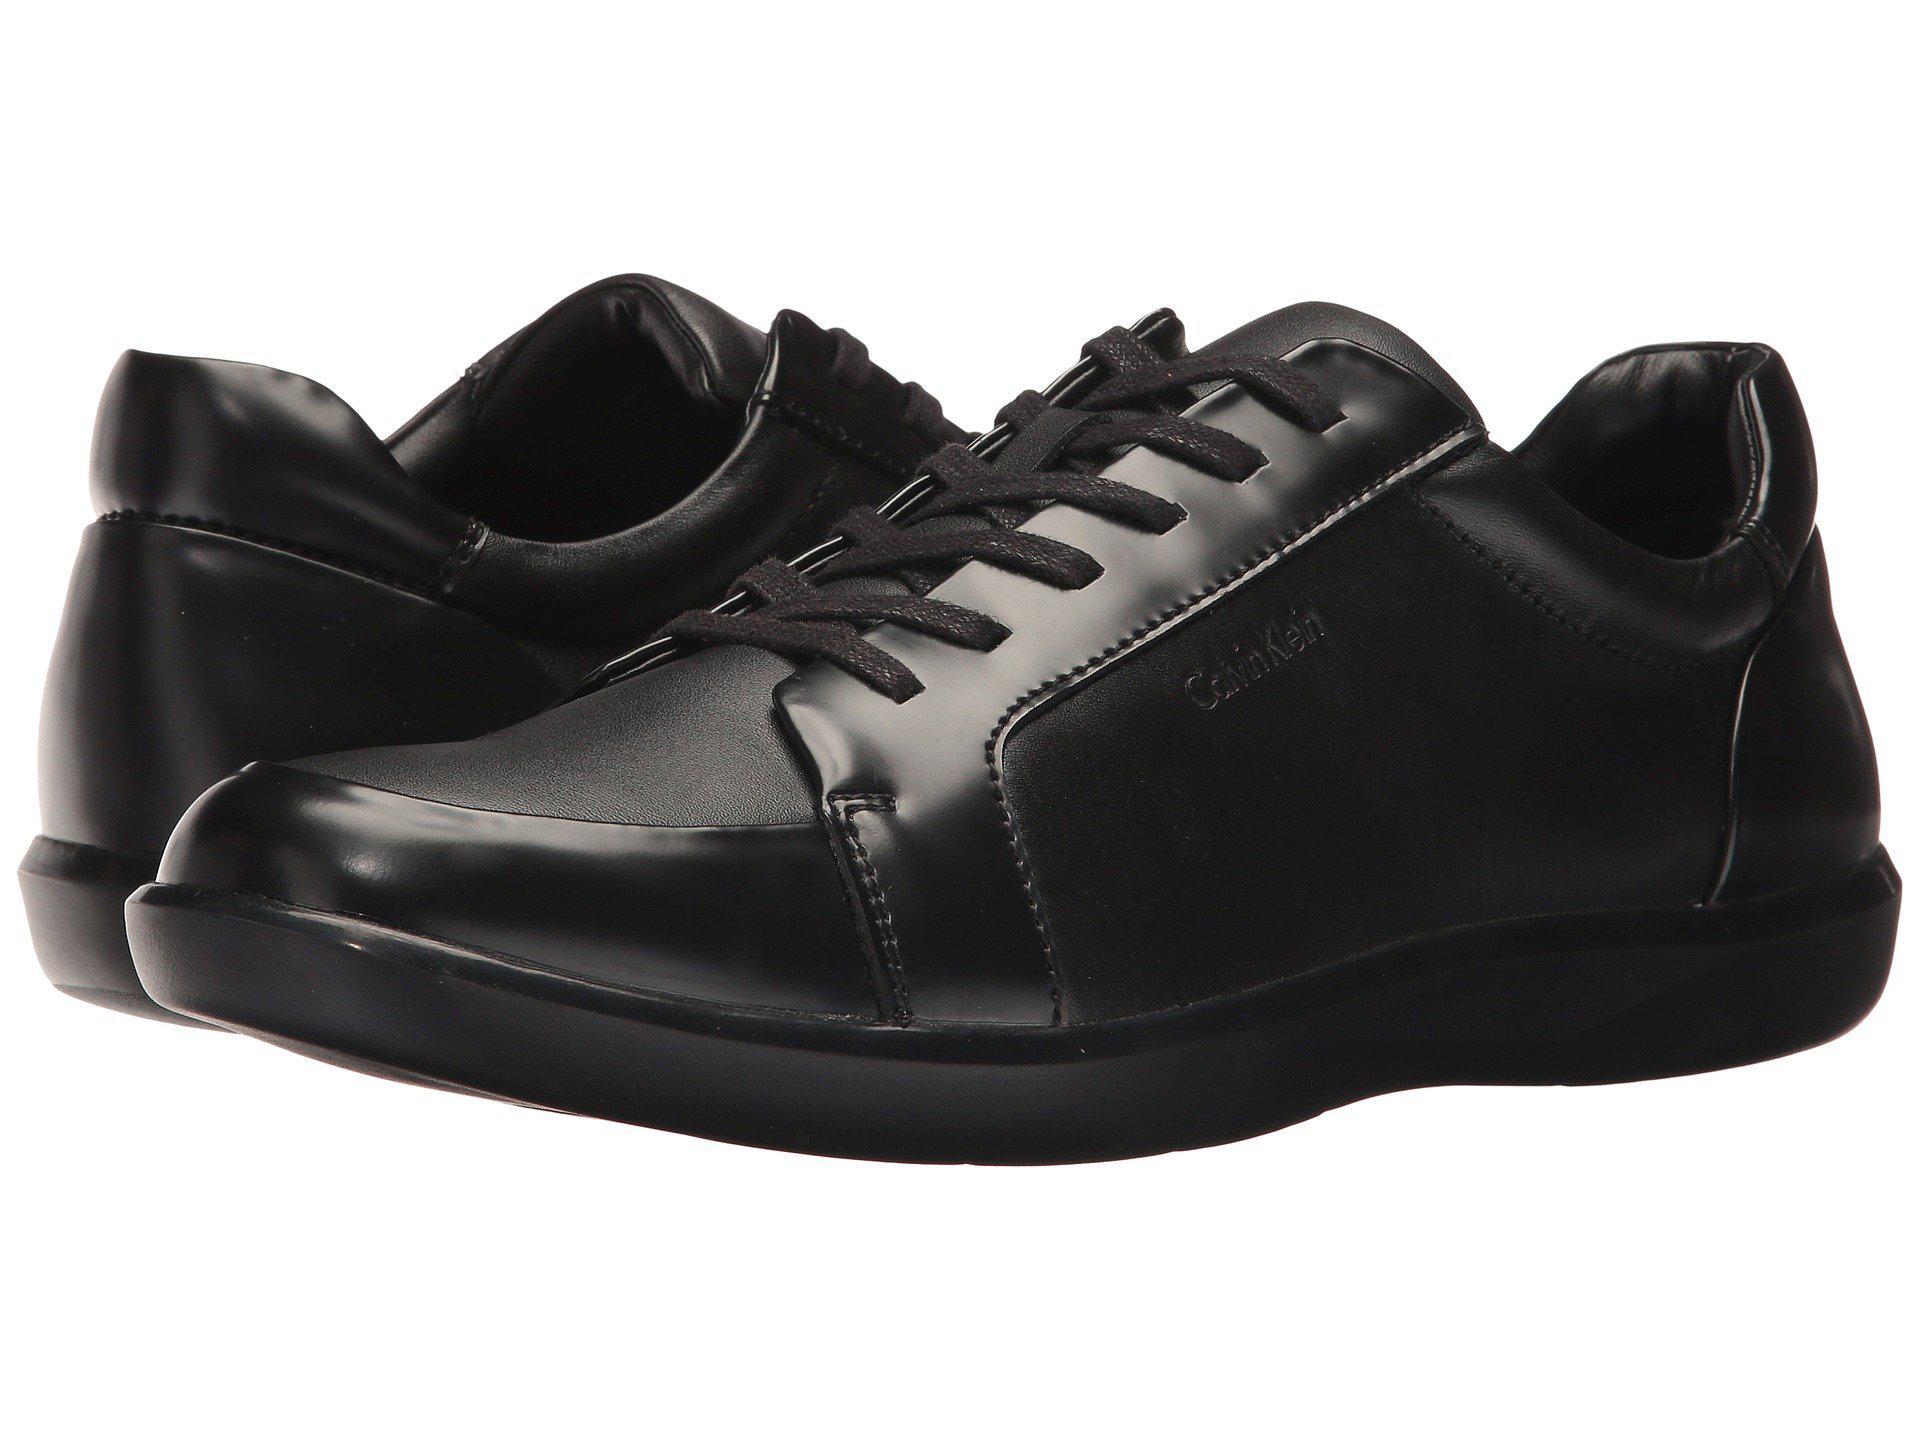 40925a4b29d3 Lyst - Calvin Klein Macabee in Black for Men - Save 14%